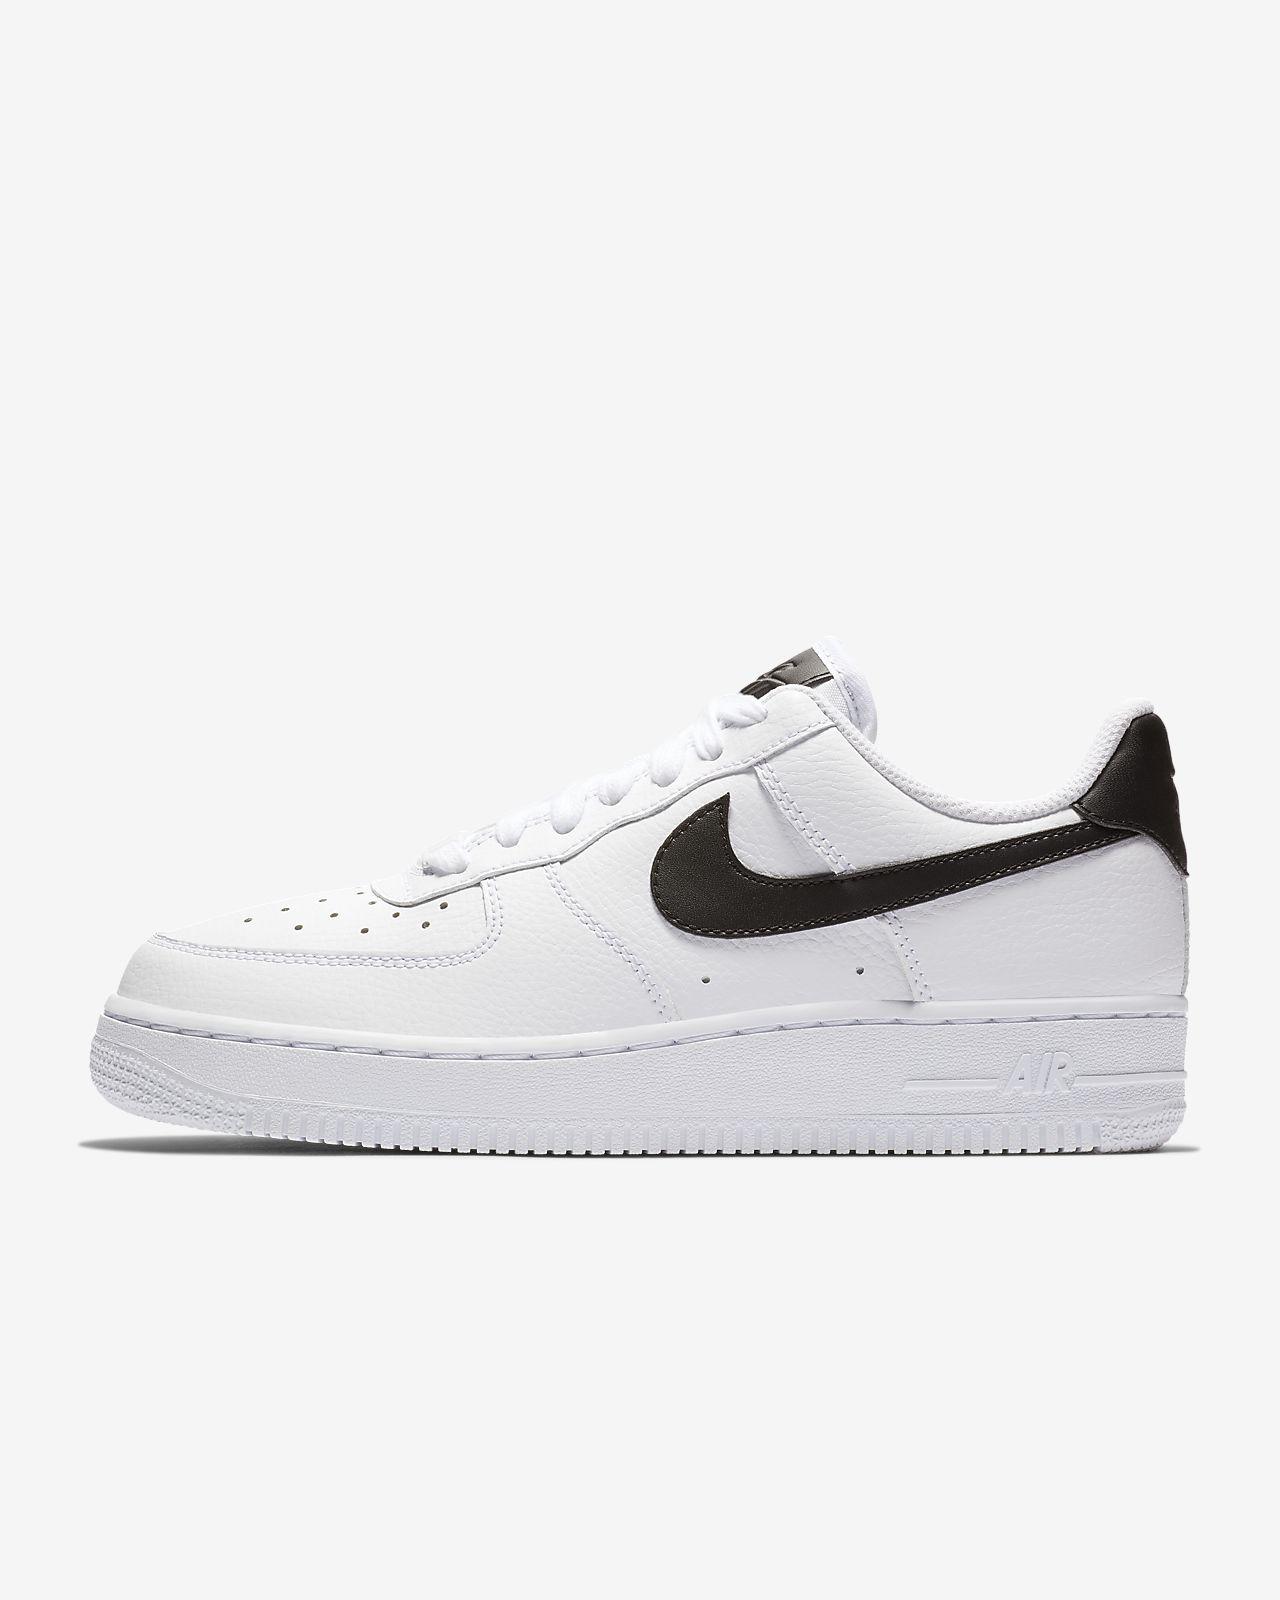 Nike Air Force 1 '07 Damenschuh